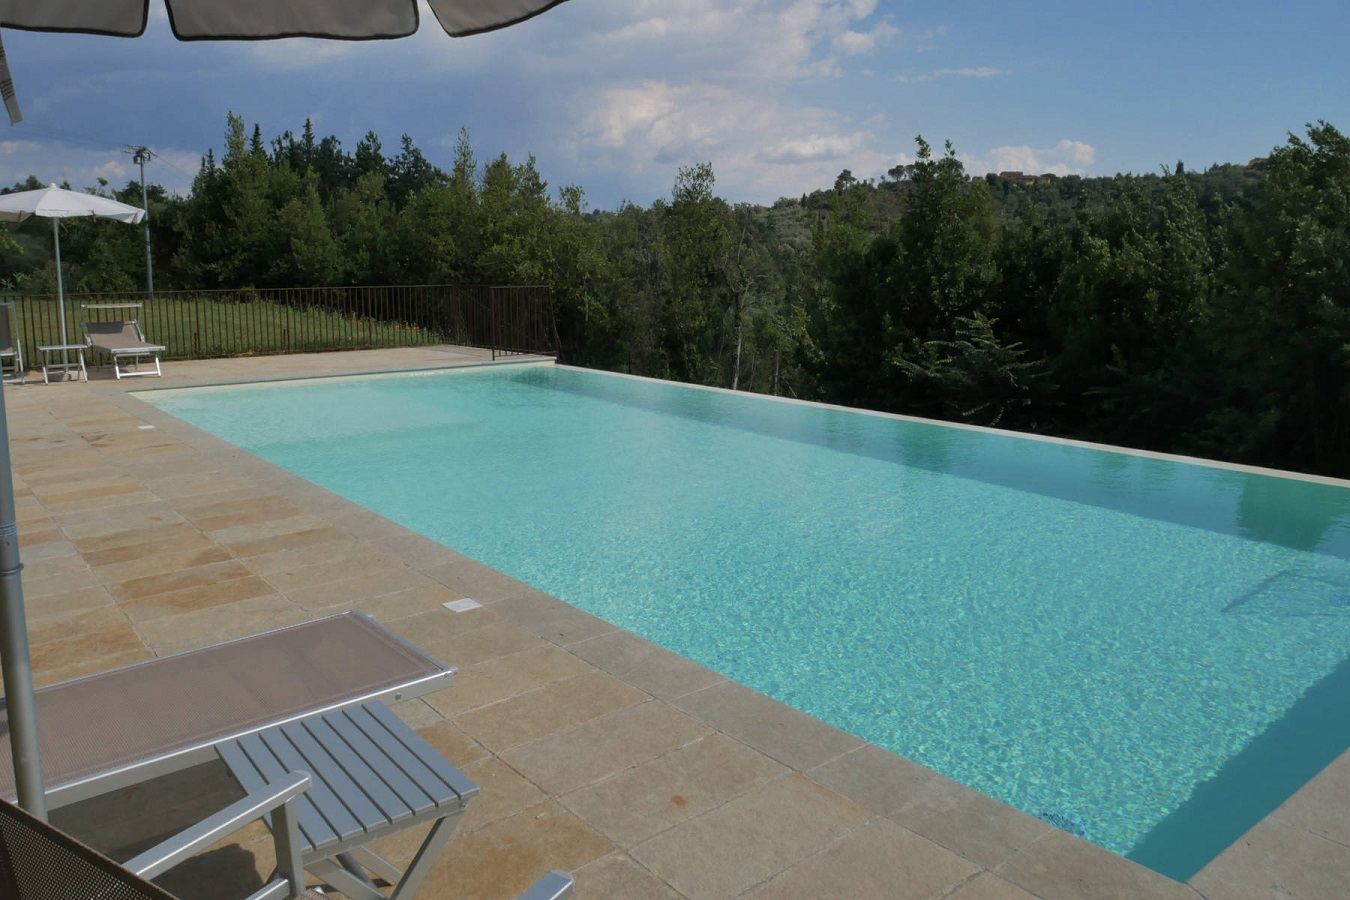 piscina02-fileminimizer.jpg